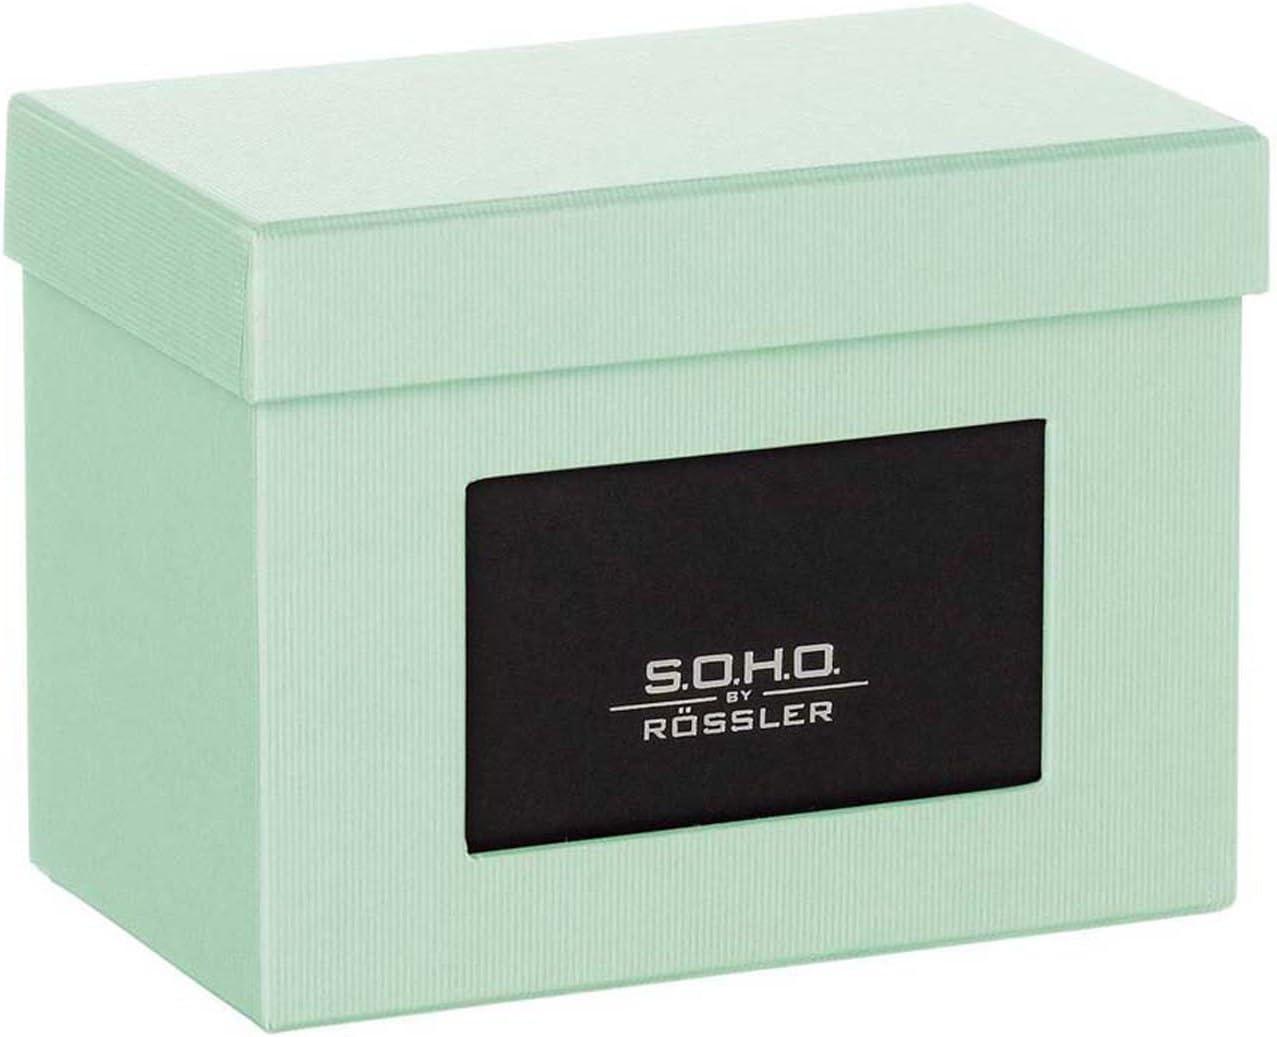 R/össler SOHO 165mm x 125mm Photo Box avec Aperture Bleu clair